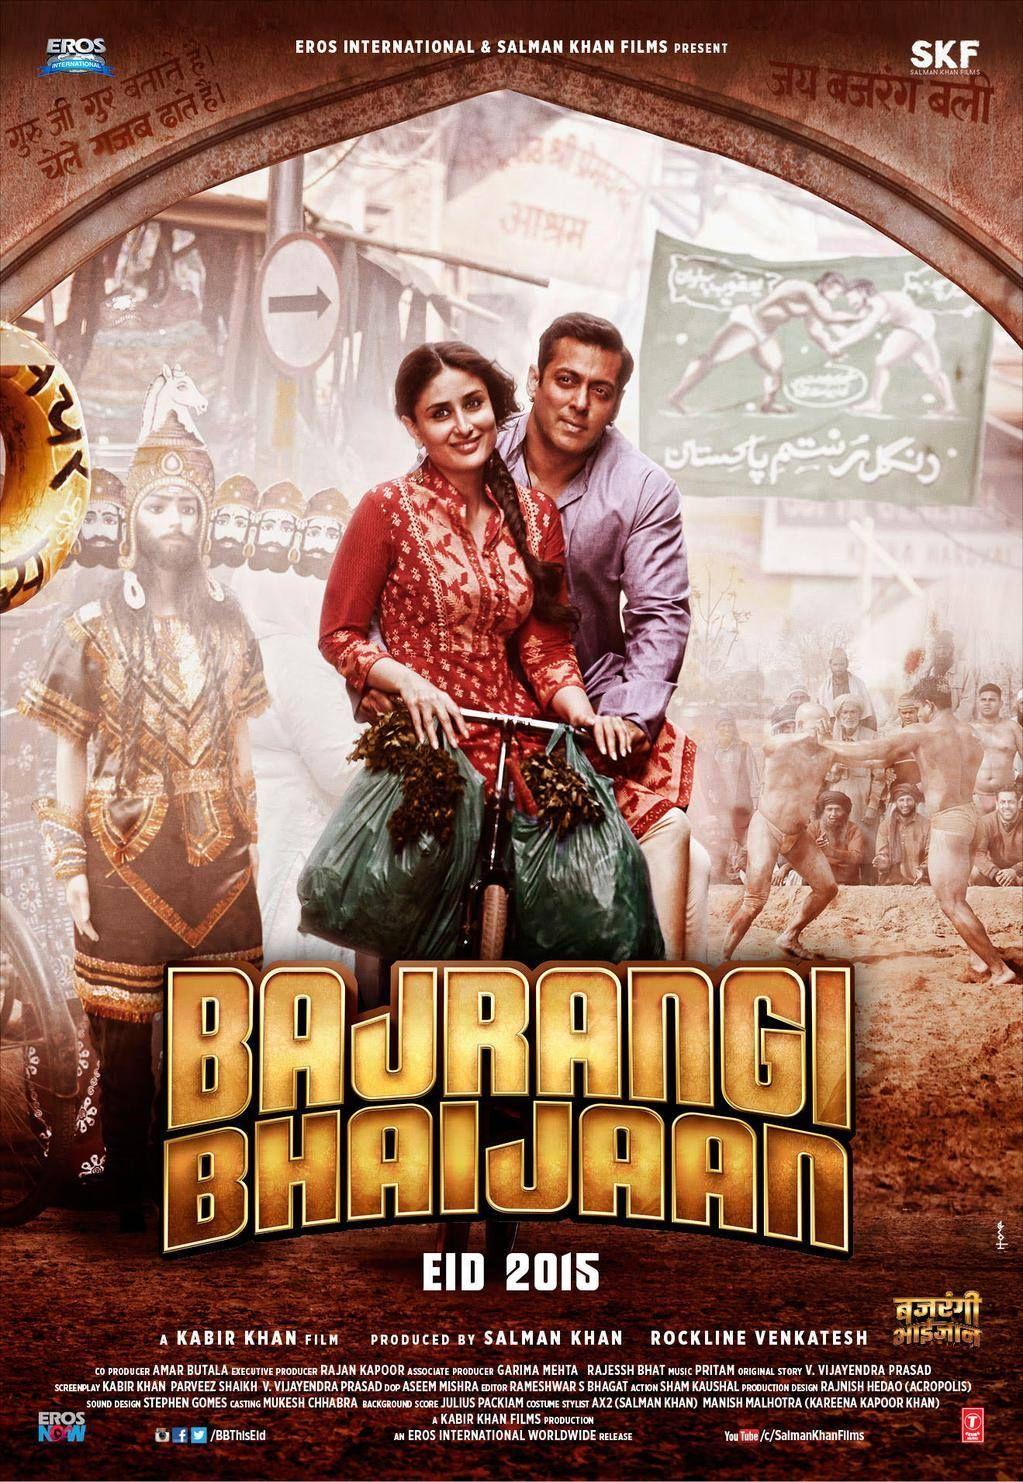 Bajrangi Bhaijaan (2015) Best bollywood movies, Hindi